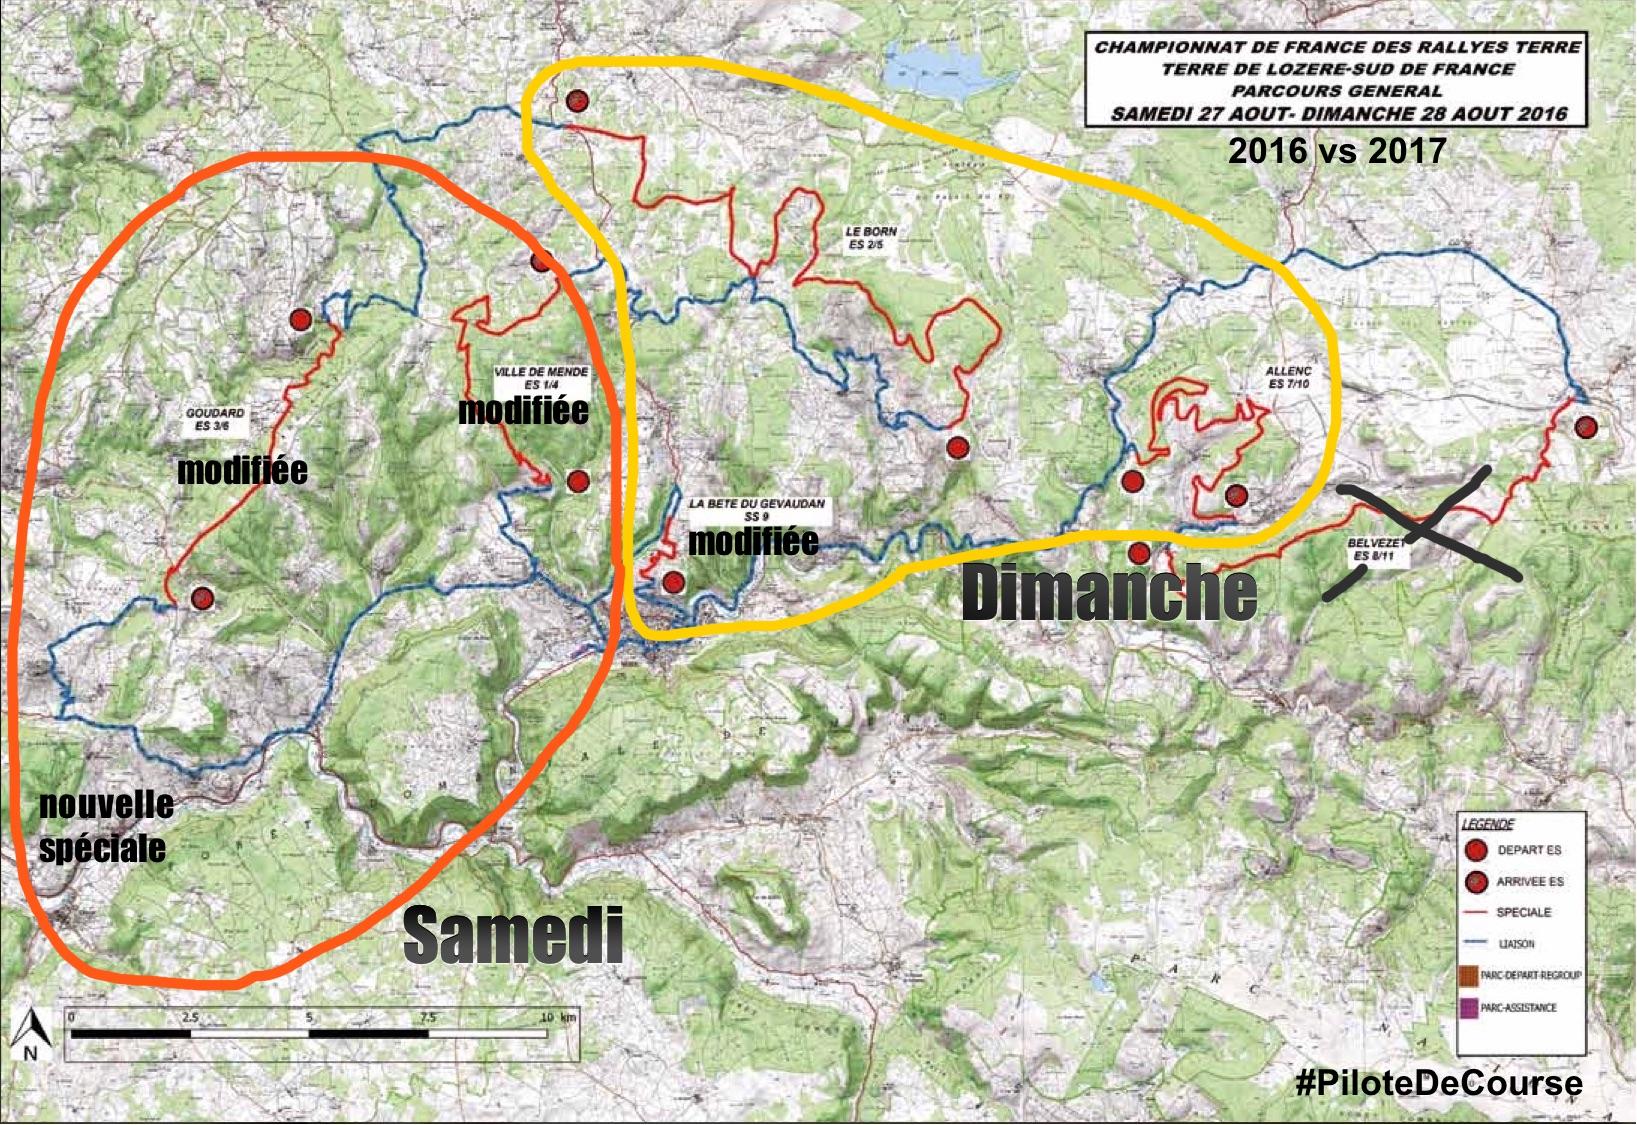 Carte Rallye Terre de Lozère 2016 vs 2017. (c) : PILOTE-DE-COURSE